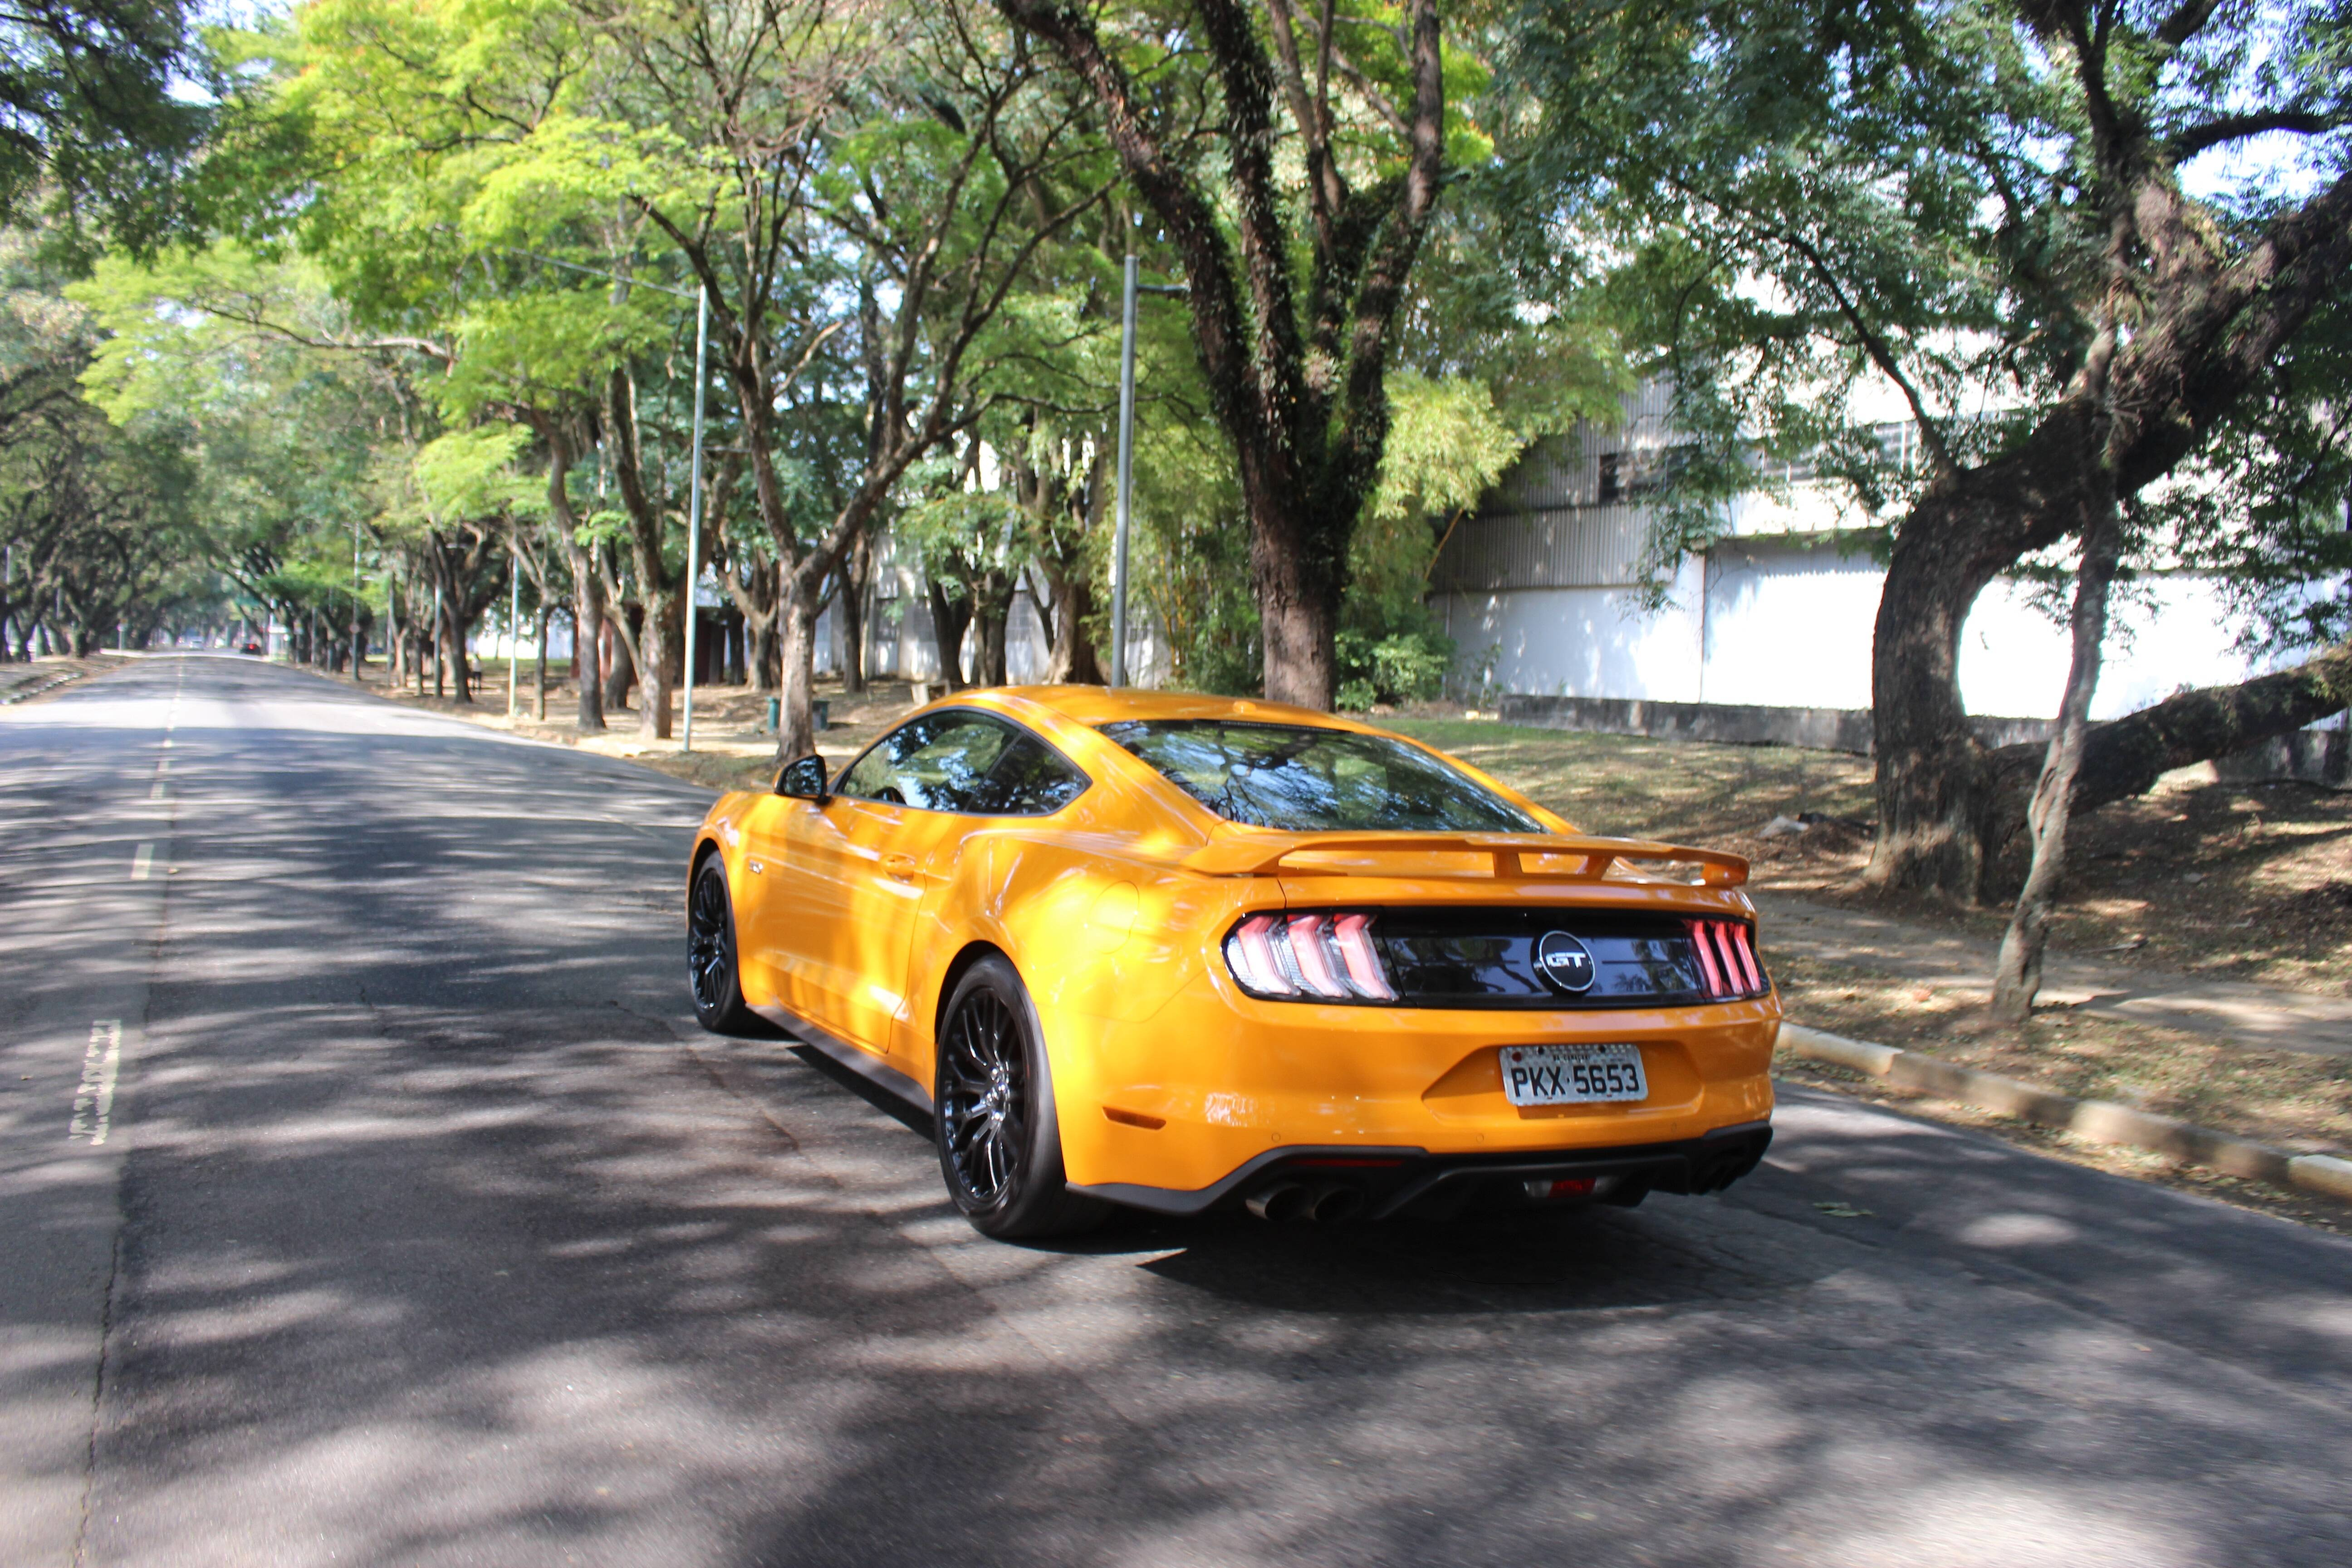 Ford Mustang. Foto: Caue Lira/iG